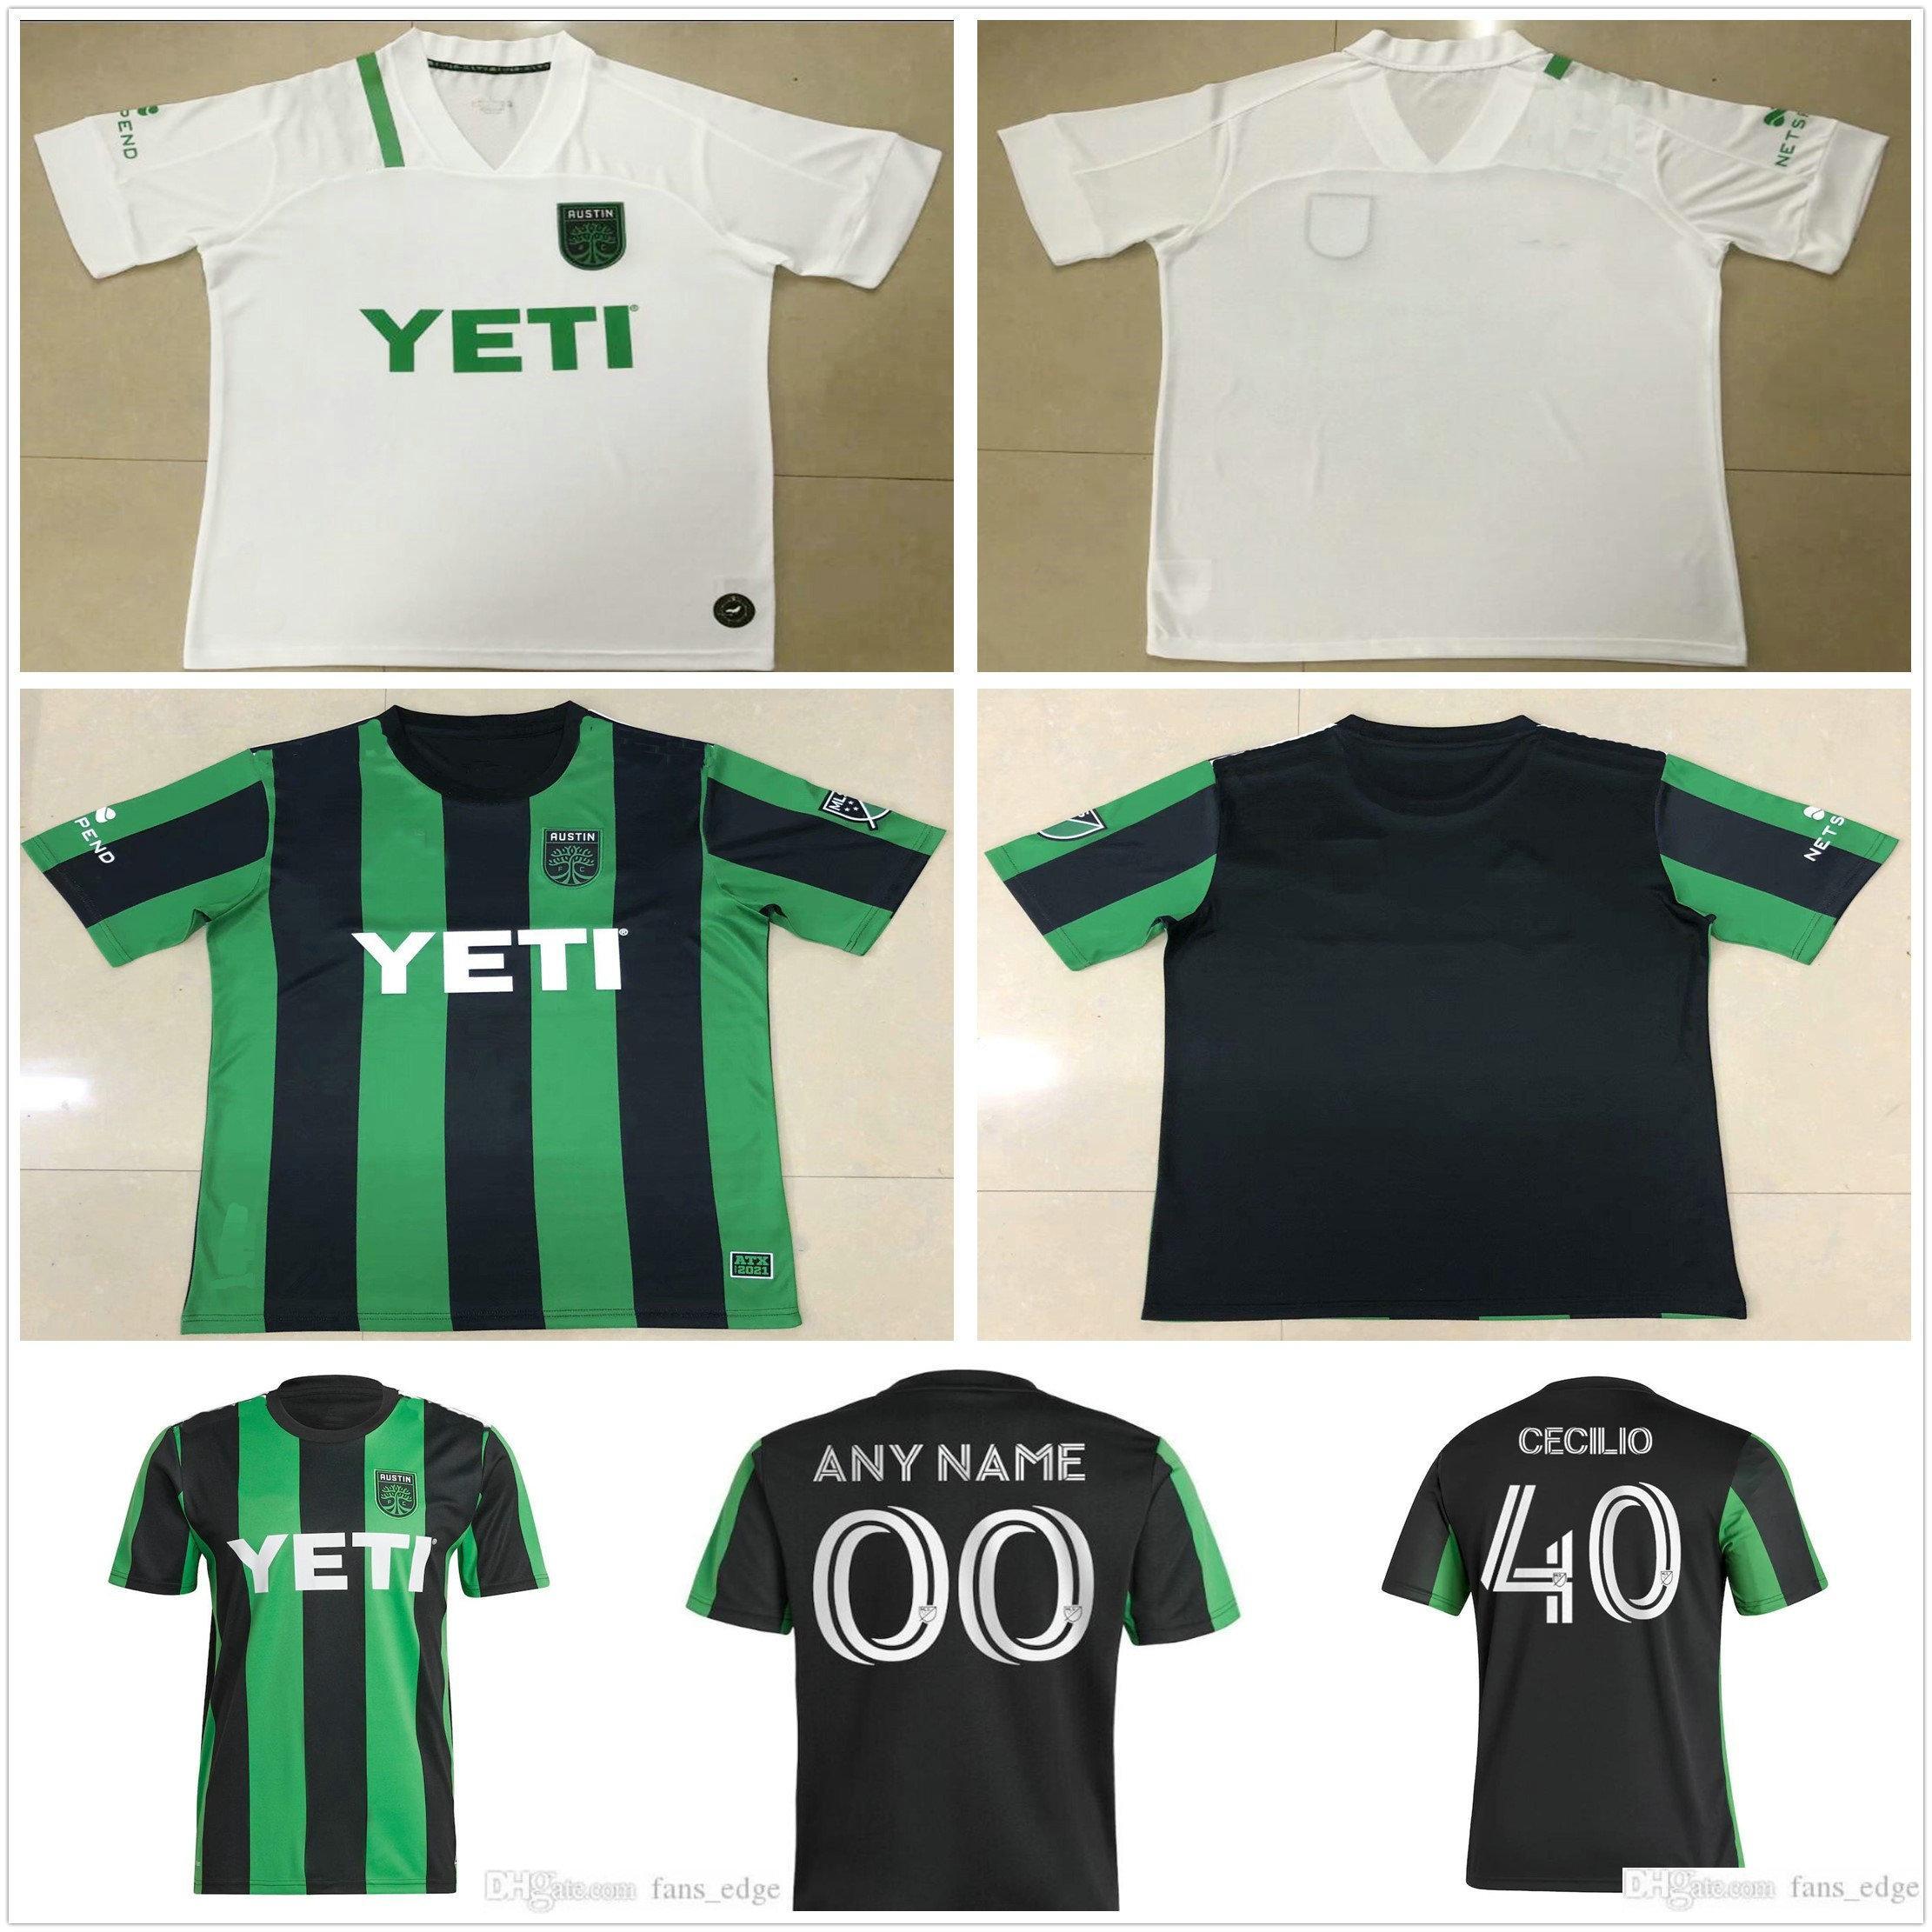 2020 2021 Austin FC Soccer Jerseys Novo Inaugural MLS 21 22 Home Black Away Branco Dario Conca Kleber Xavier Baez Personalizar camisas de futebol